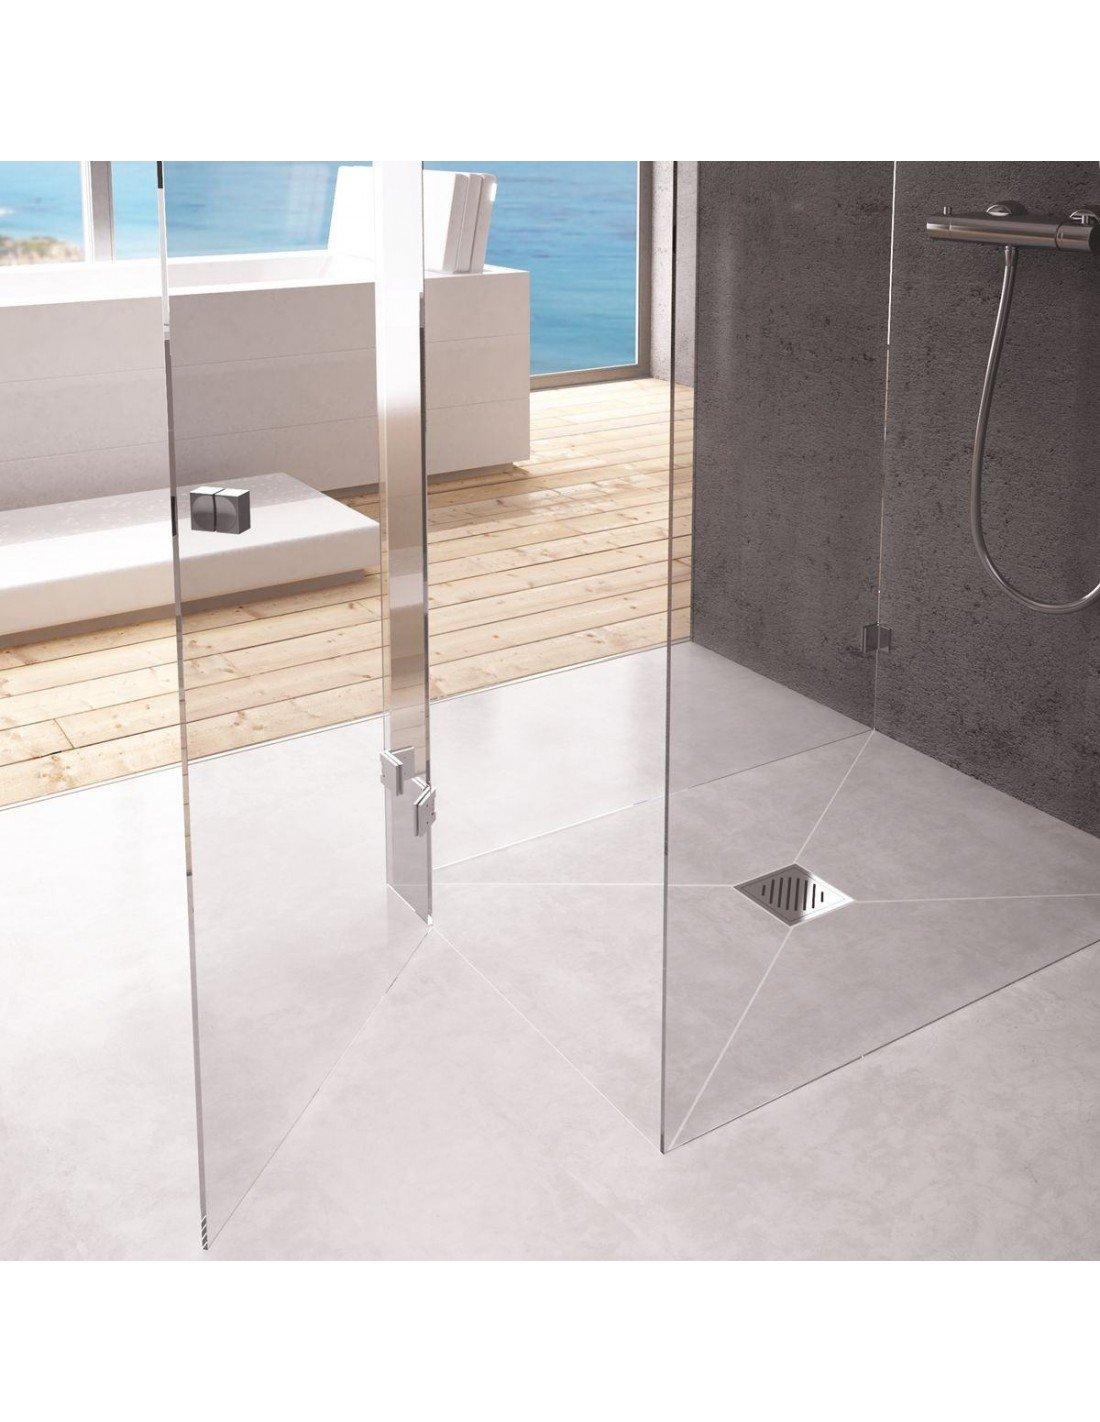 wet room kit shower tray 800 x 1200 linear end drain walk. Black Bedroom Furniture Sets. Home Design Ideas